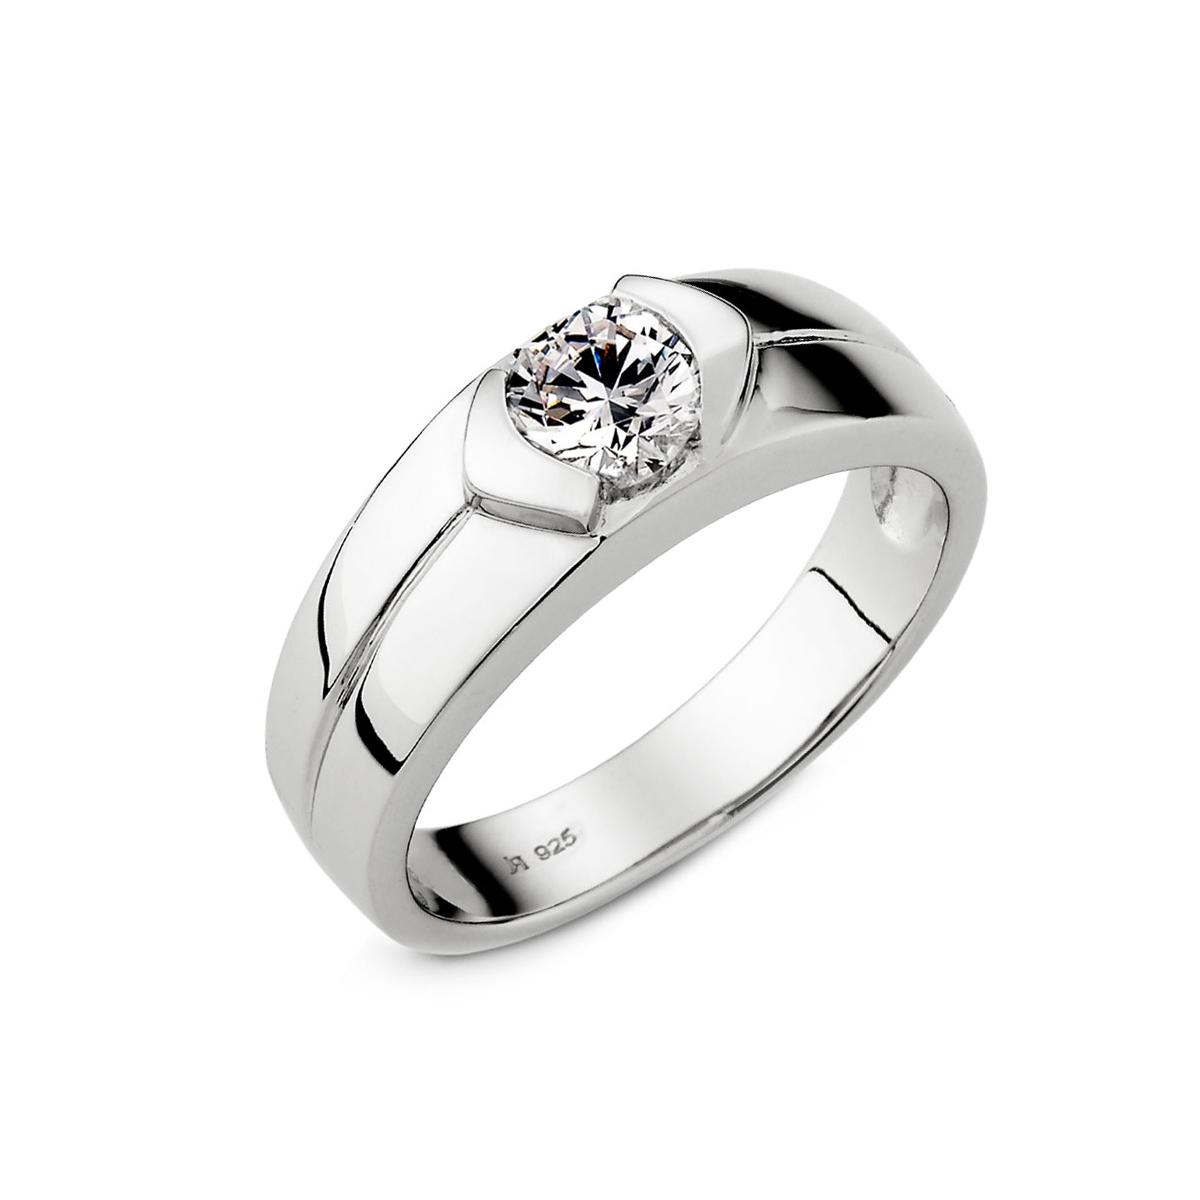 KSM52 真情告白單鑽流線感戒指